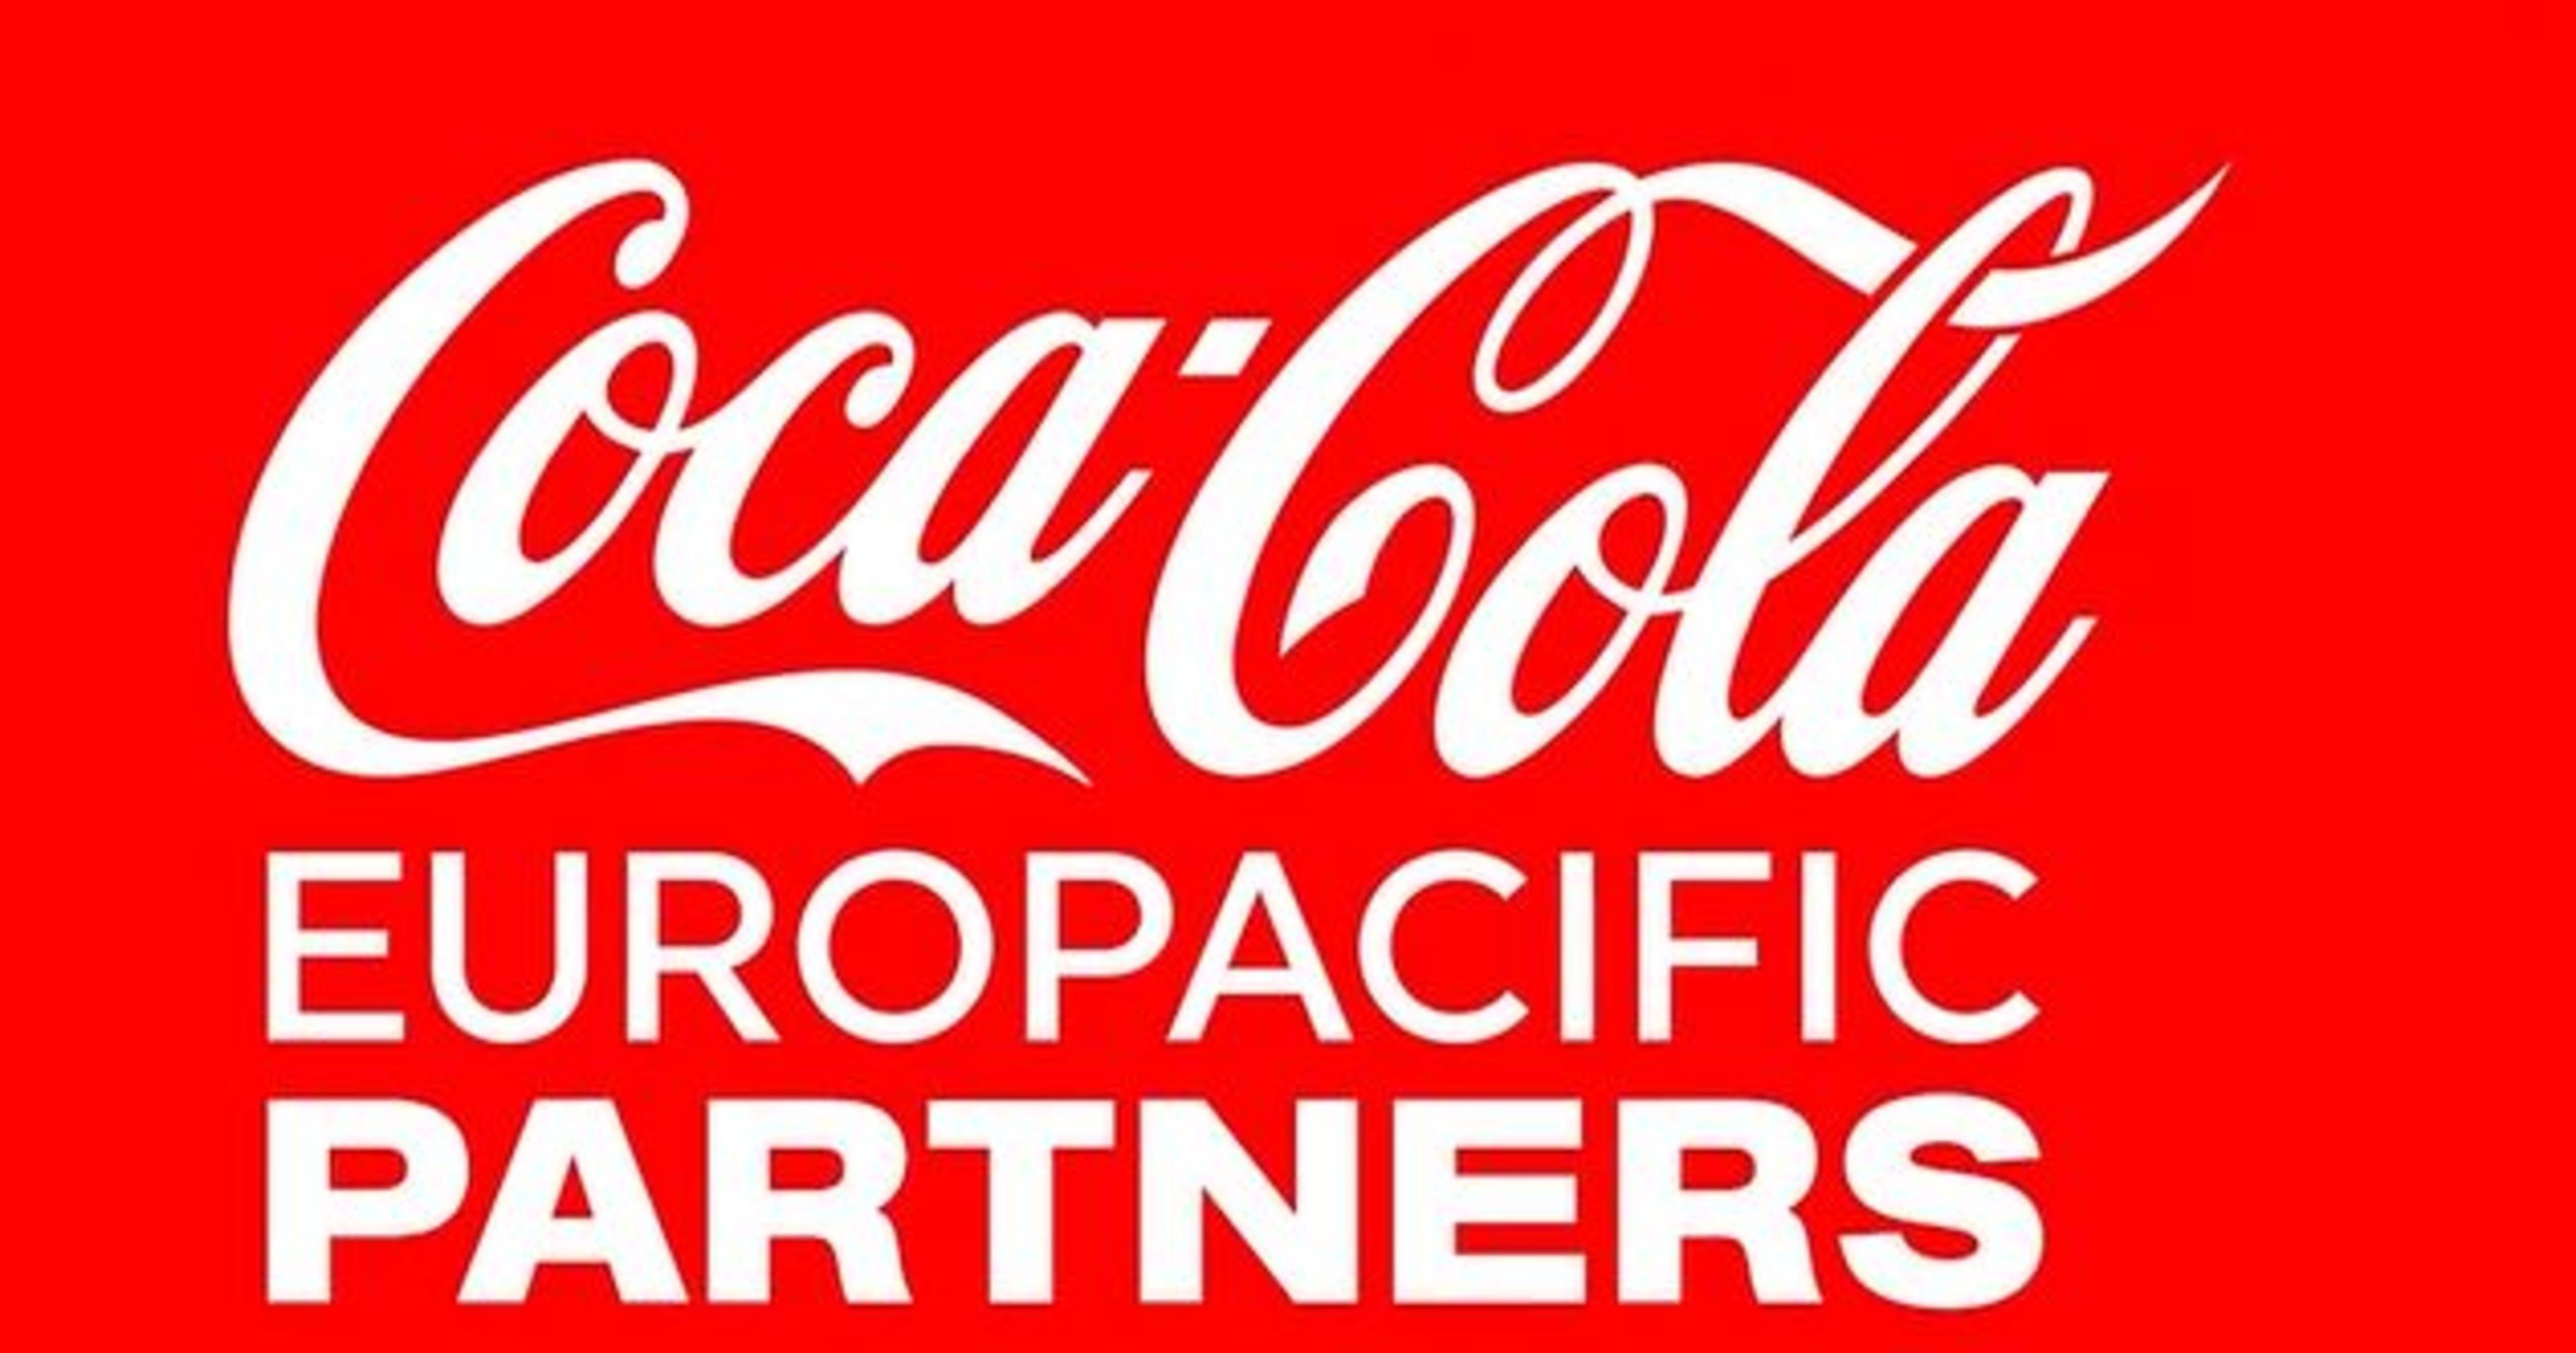 logo Coca-Cola Europacific Partners